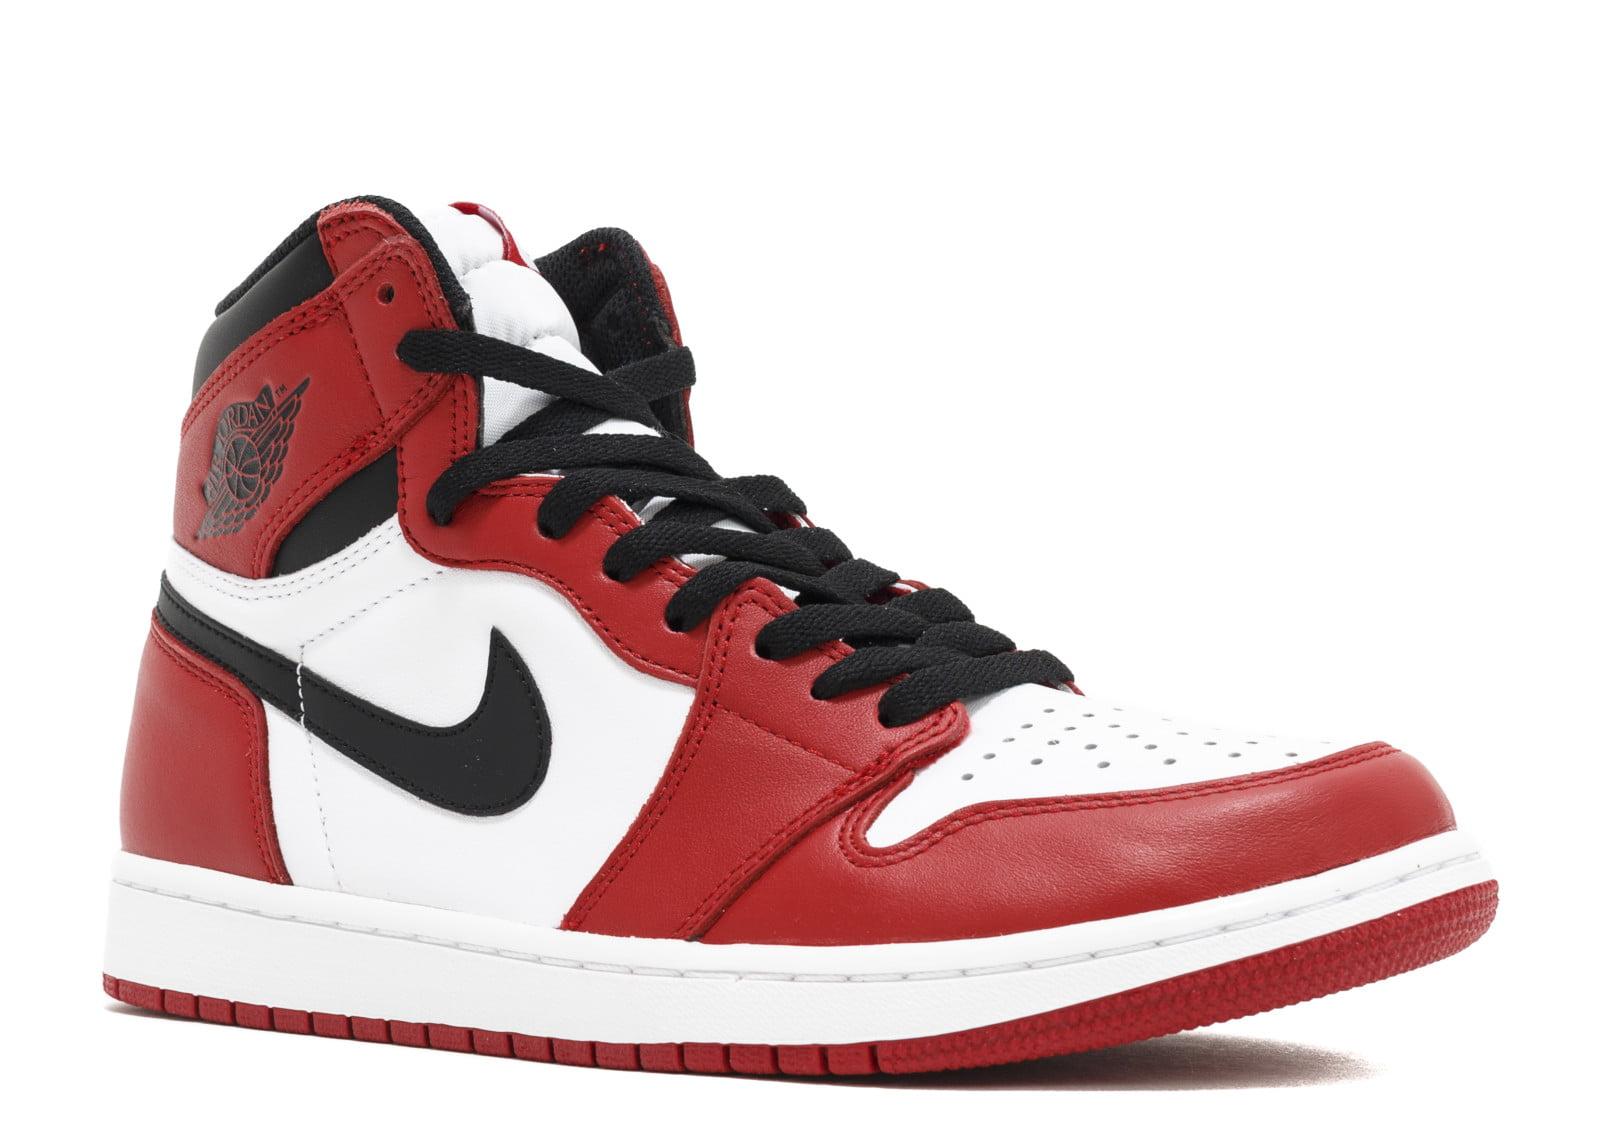 faa8bec5bc6f Air Jordan - Men - Air Jordan 1 Retro High Og  Chicago  - 555088-101 - Size  14